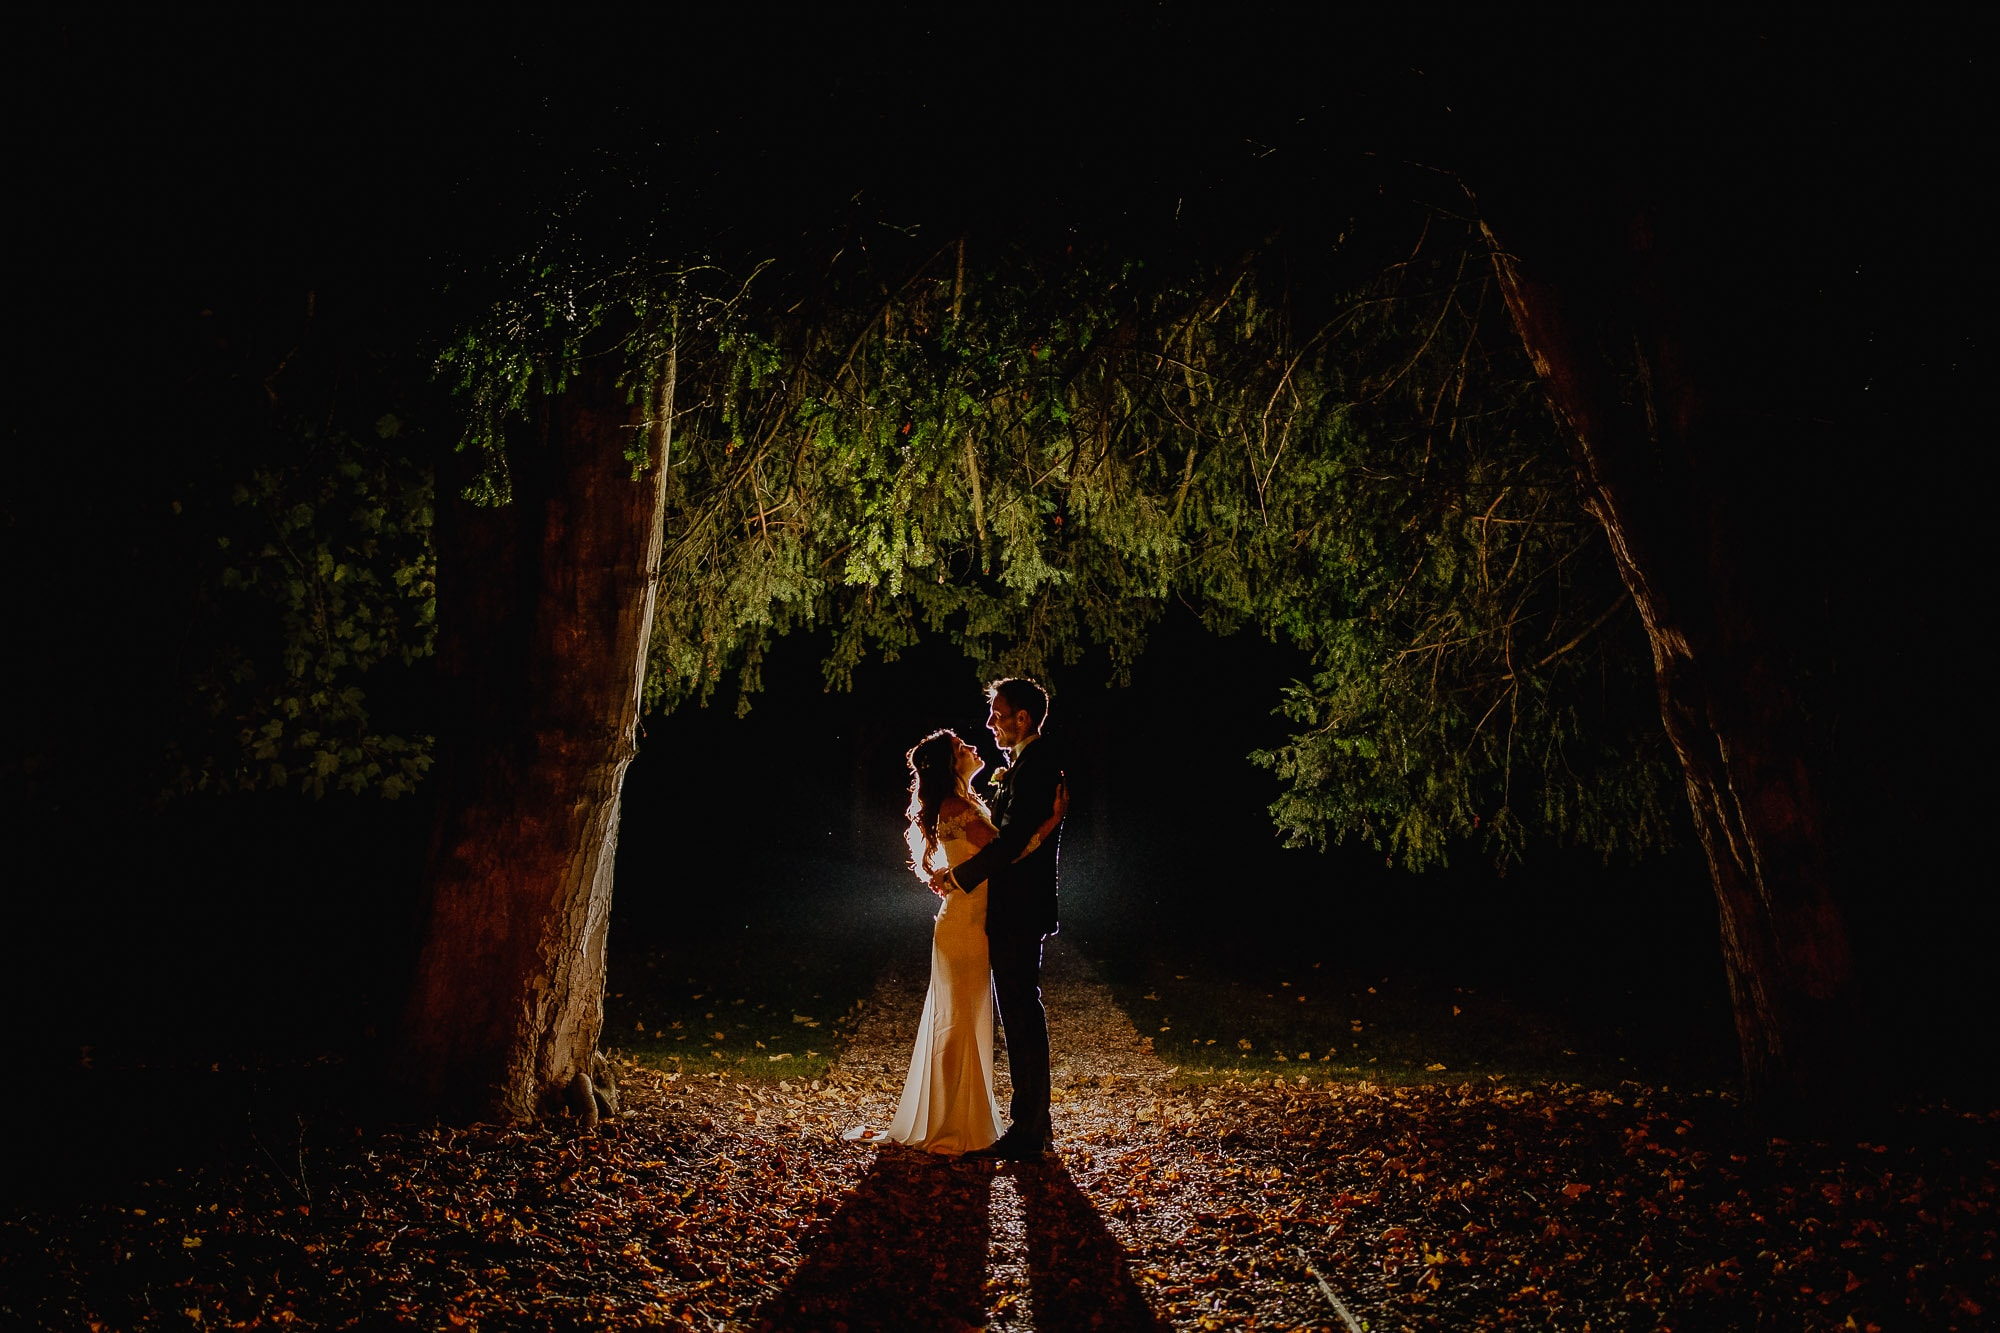 Night portrait of wedding couple standing under a tree.